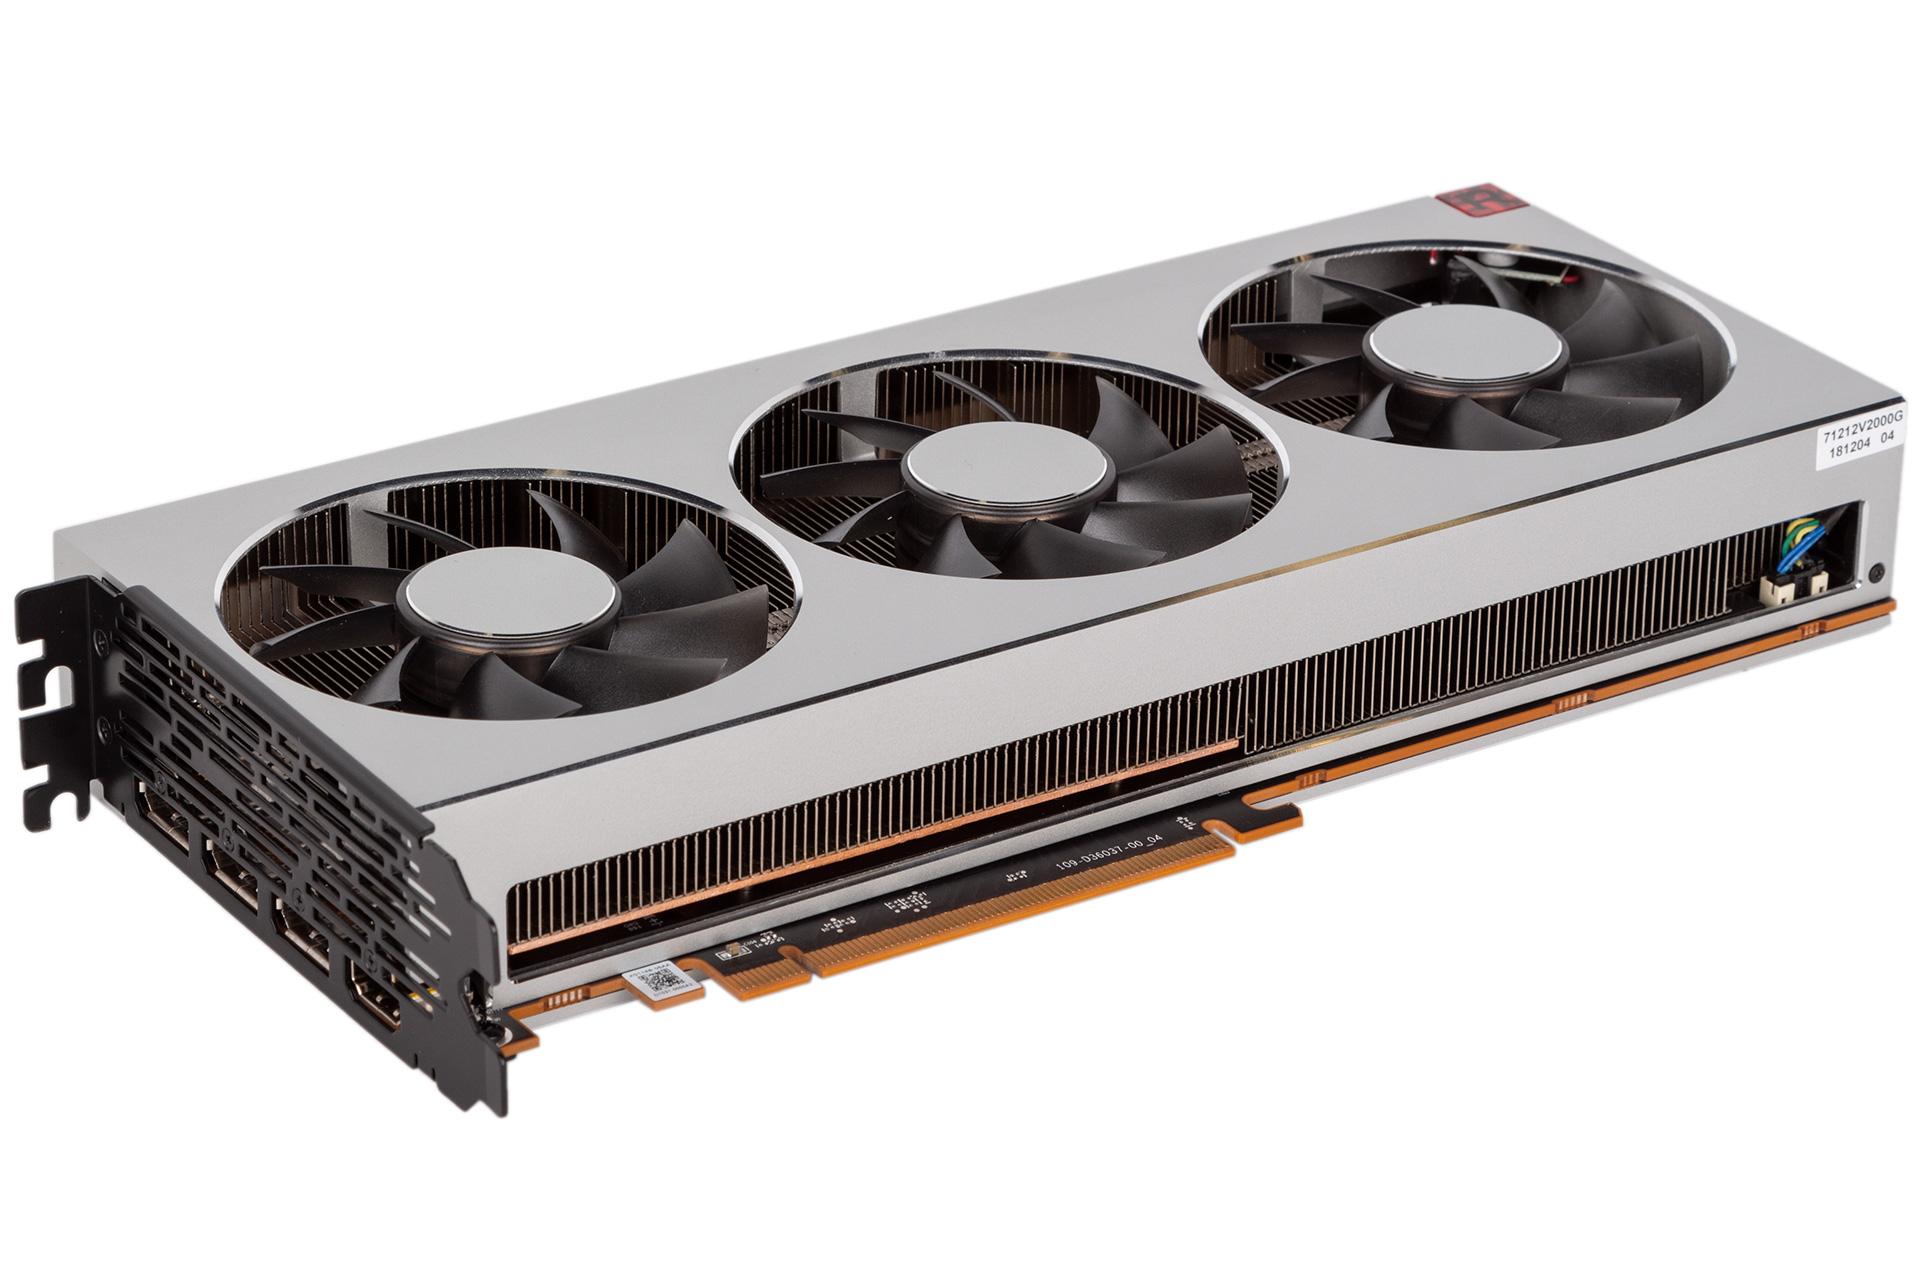 AMD Radeon VII Review: Seventh Son or Seventh Sin? | bit-tech net